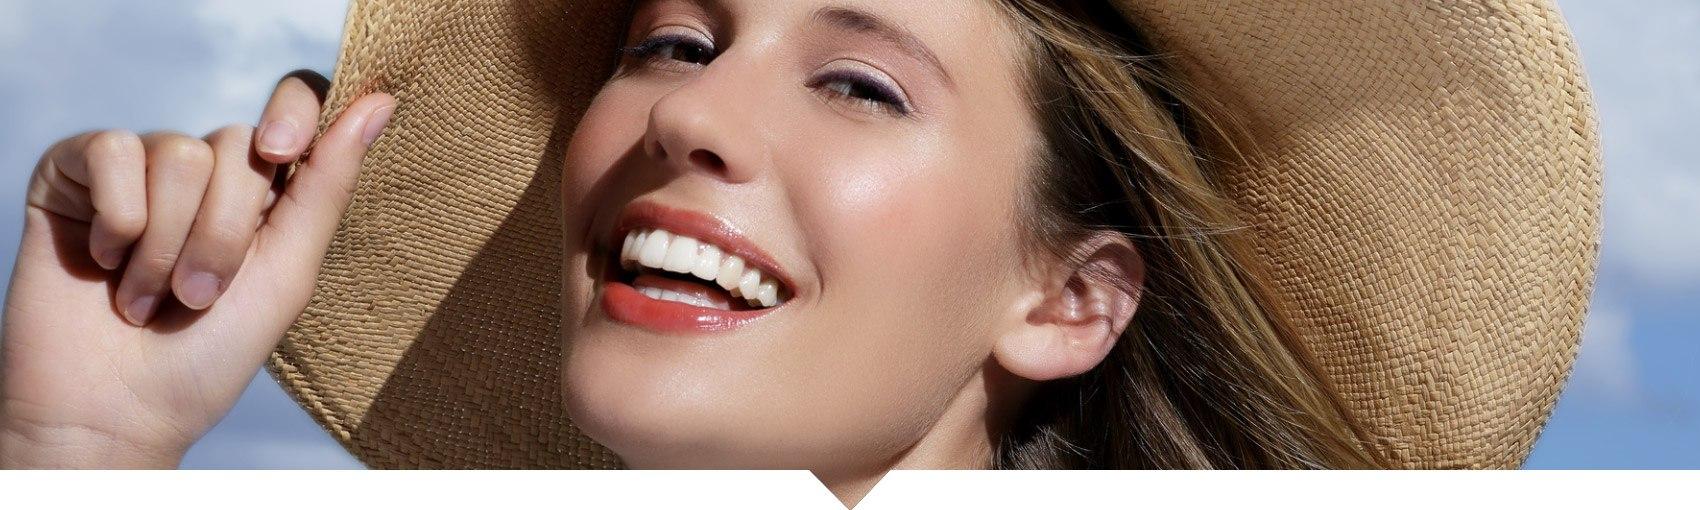 Teeth Whitening, CA